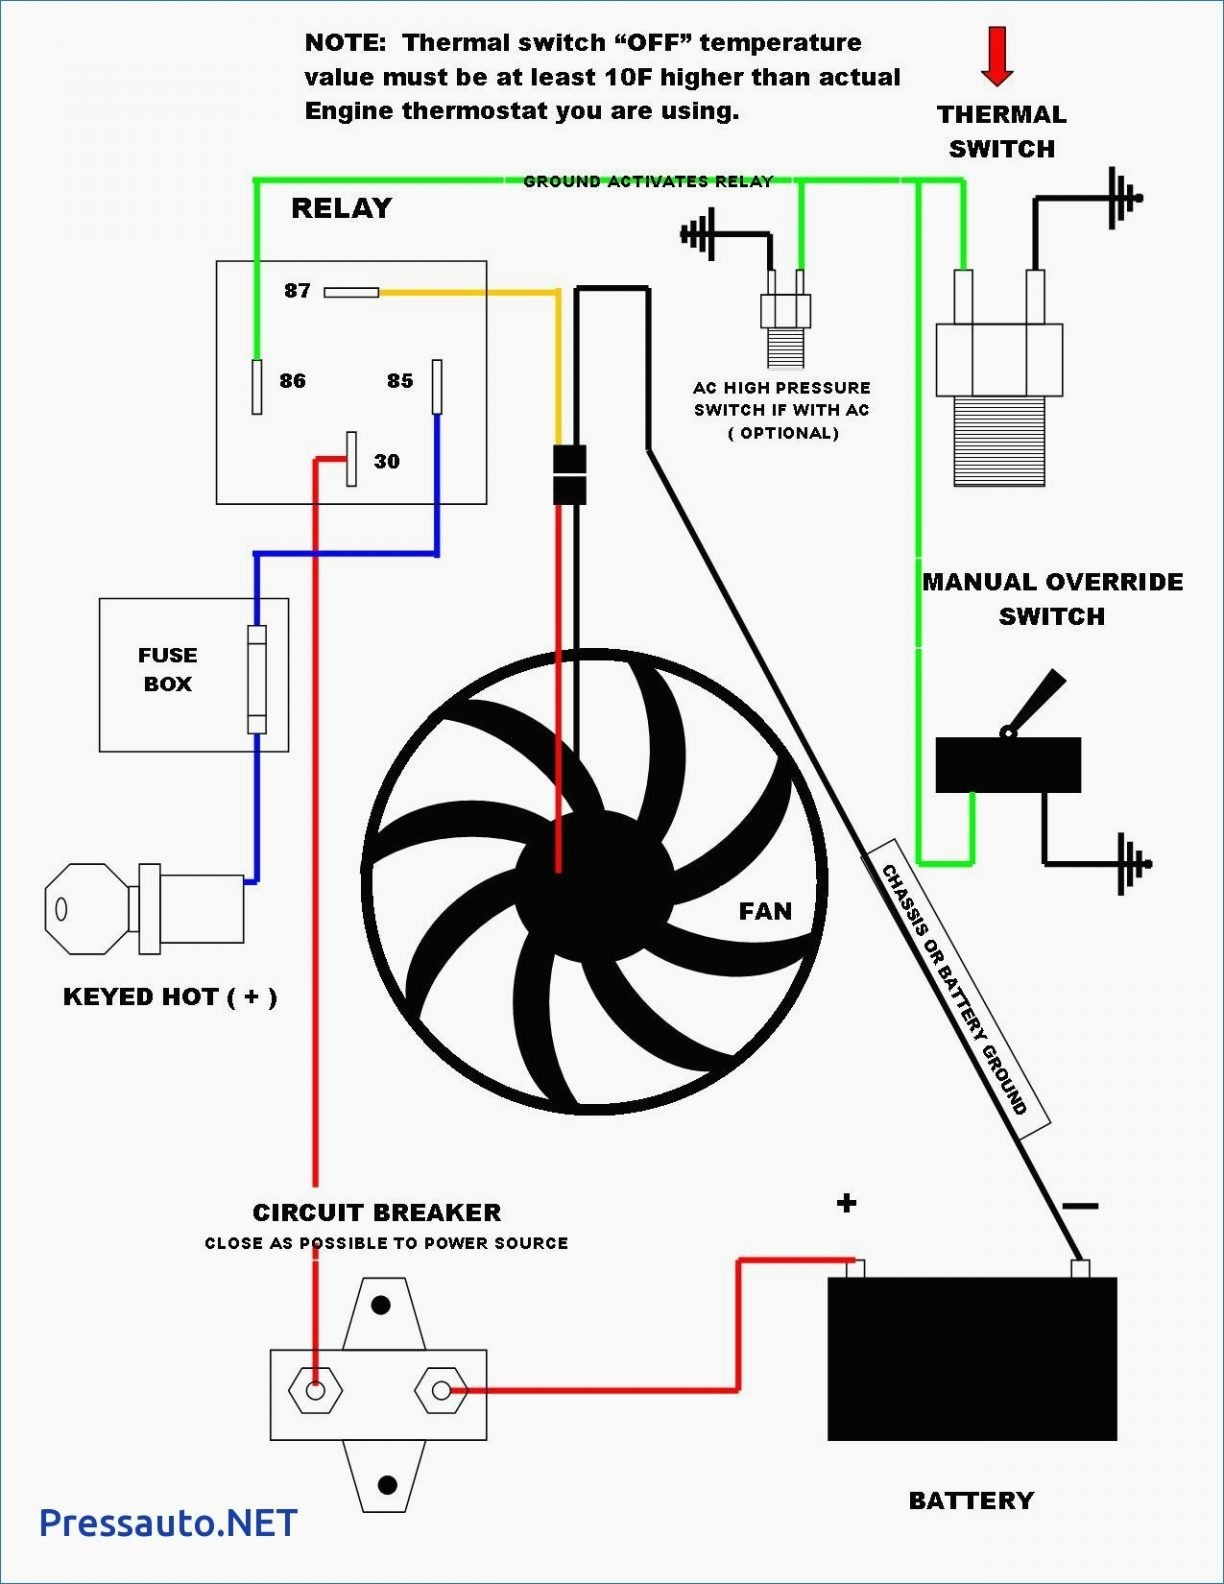 7 Pin Trailer Wiring Diagram with Brakes Fresh Wiring Diagram Big Tex Trailer Fresh Wiring Diagram Big Tex